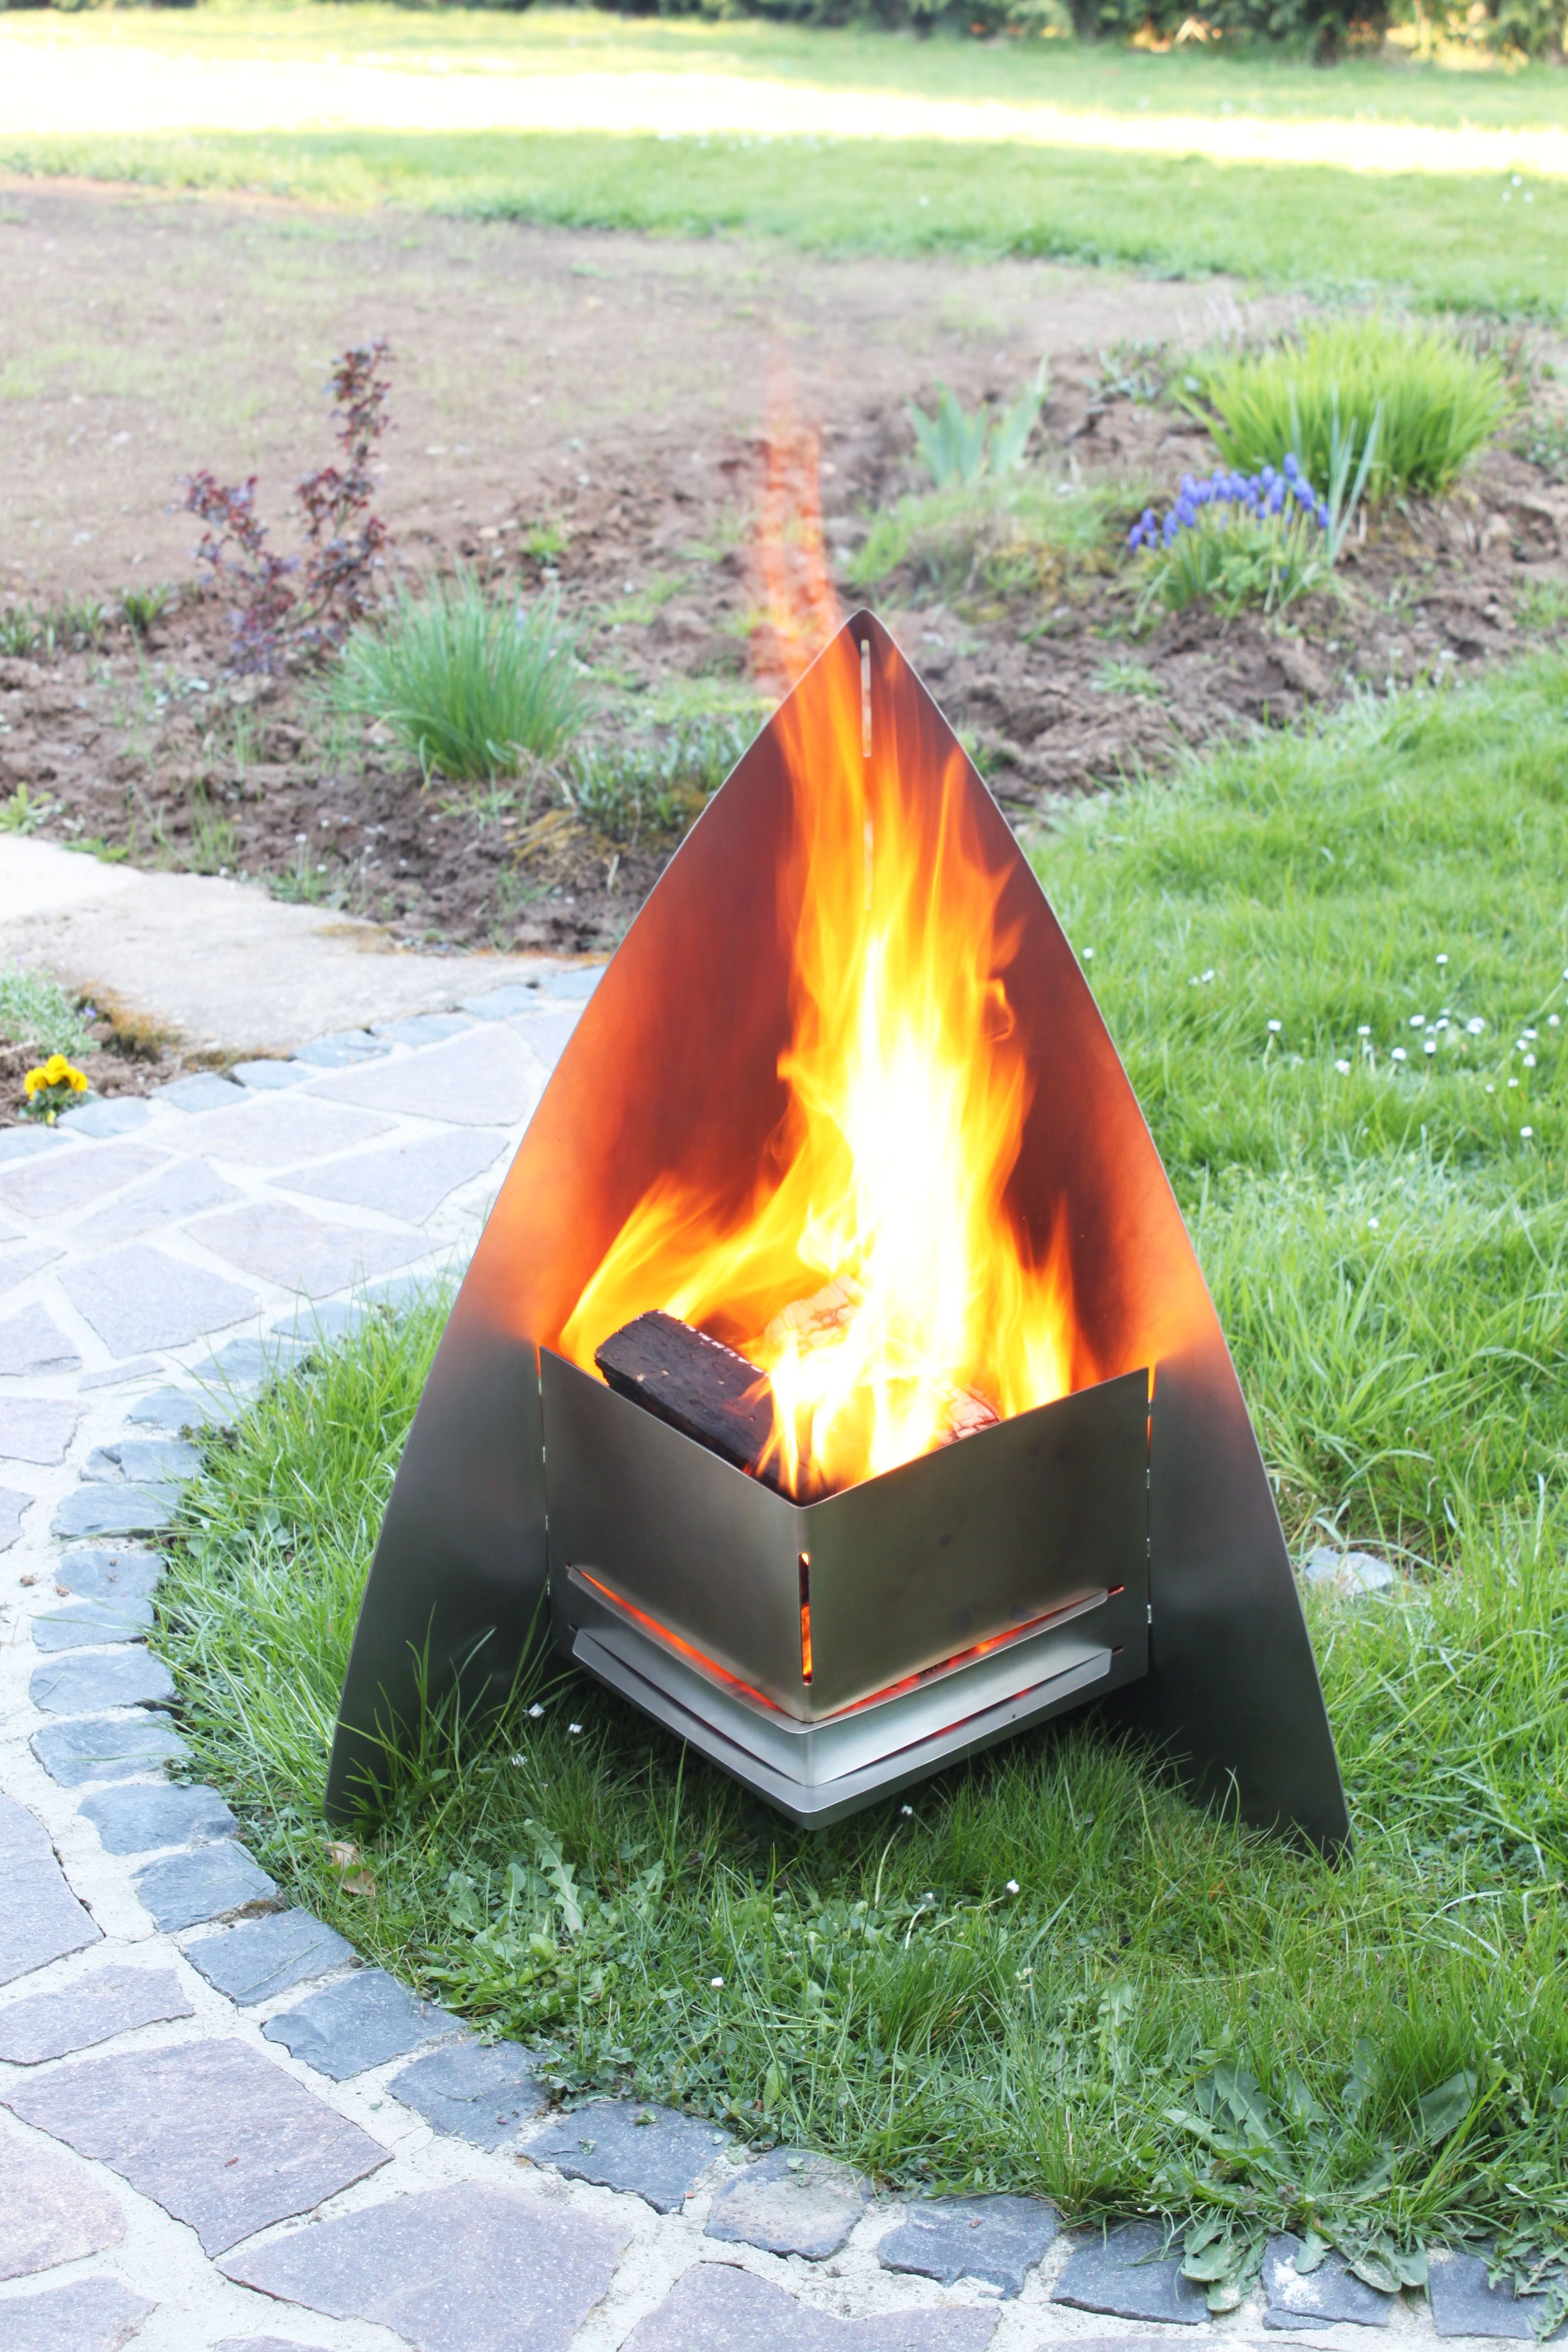 Fesselnd Design Edelstahl Feuerkorb Feuerschale U201cFireSpaceu201d   Die Feuerstelle  Reflektiert Durch Dach Rückseitige Blech Wärme